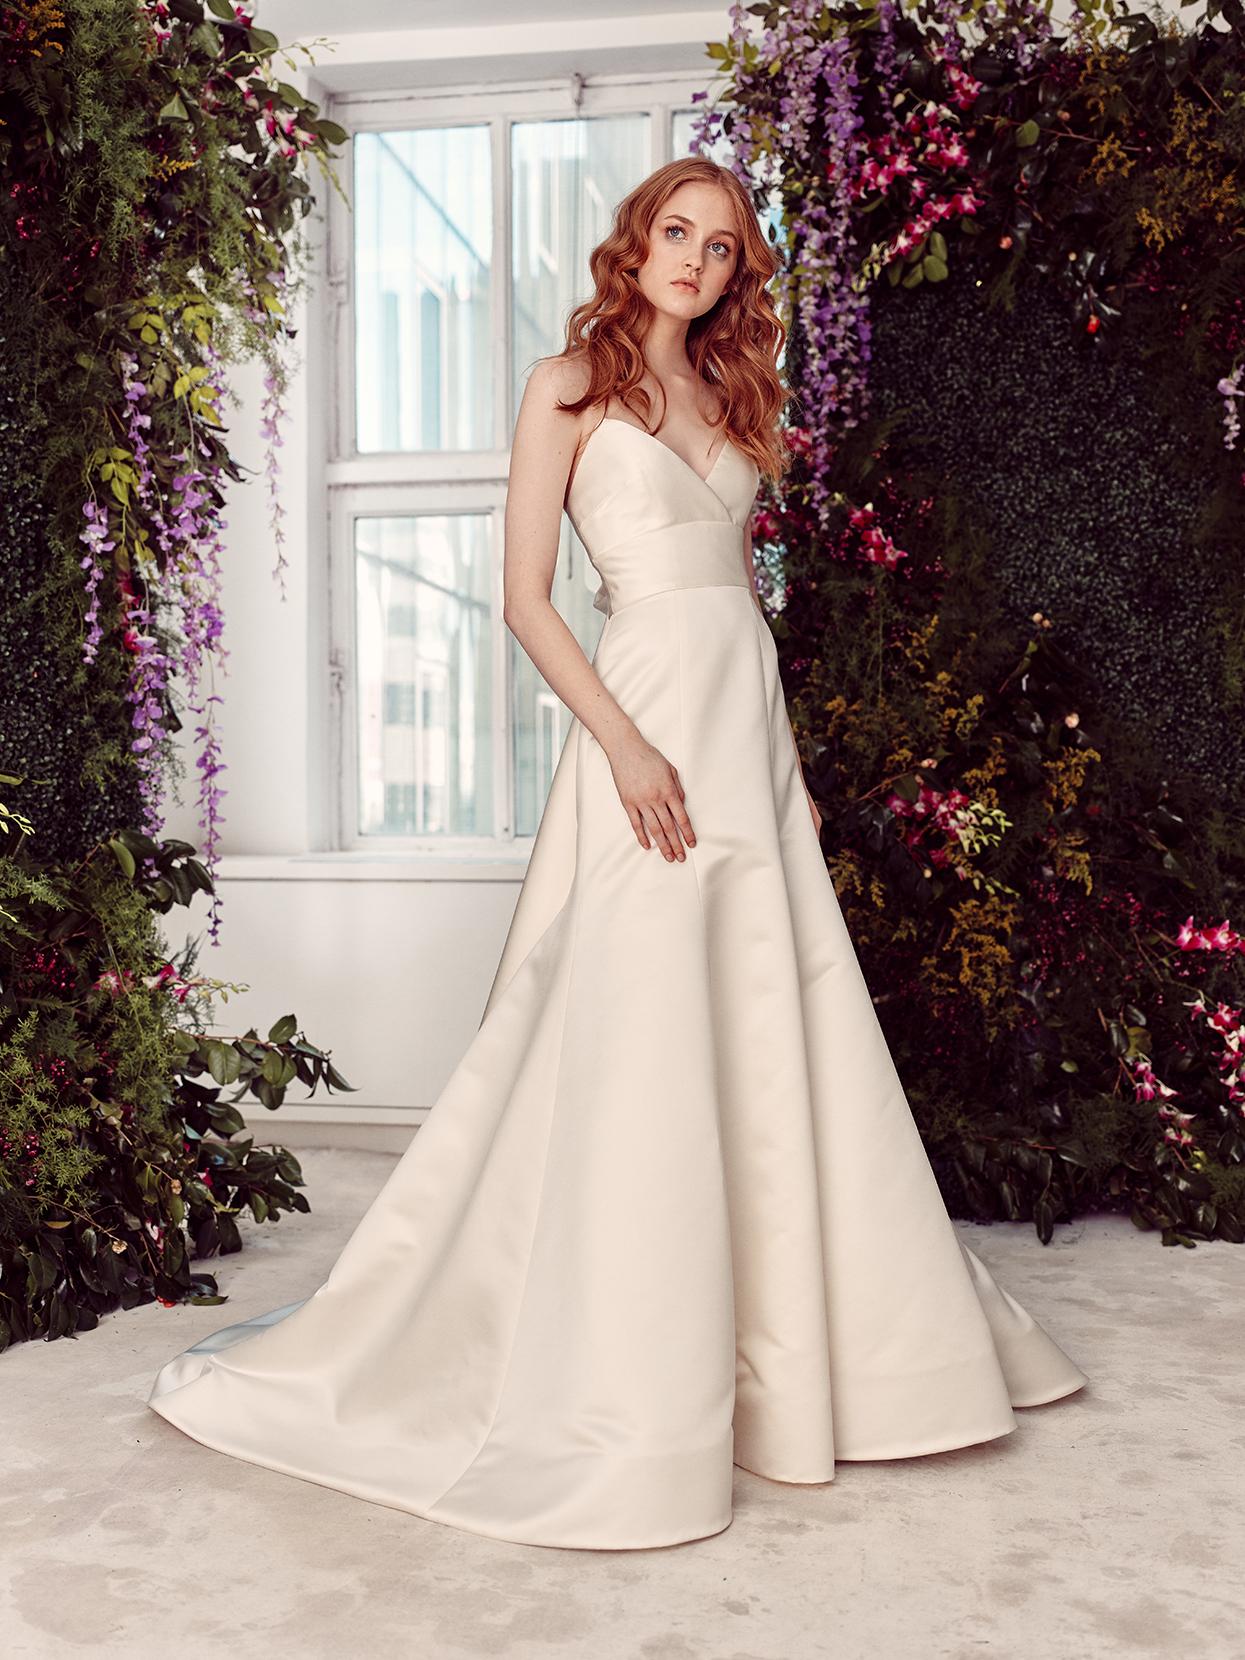 alyne by rita vinieris strapless a-line with sash wedding dress spring 2020